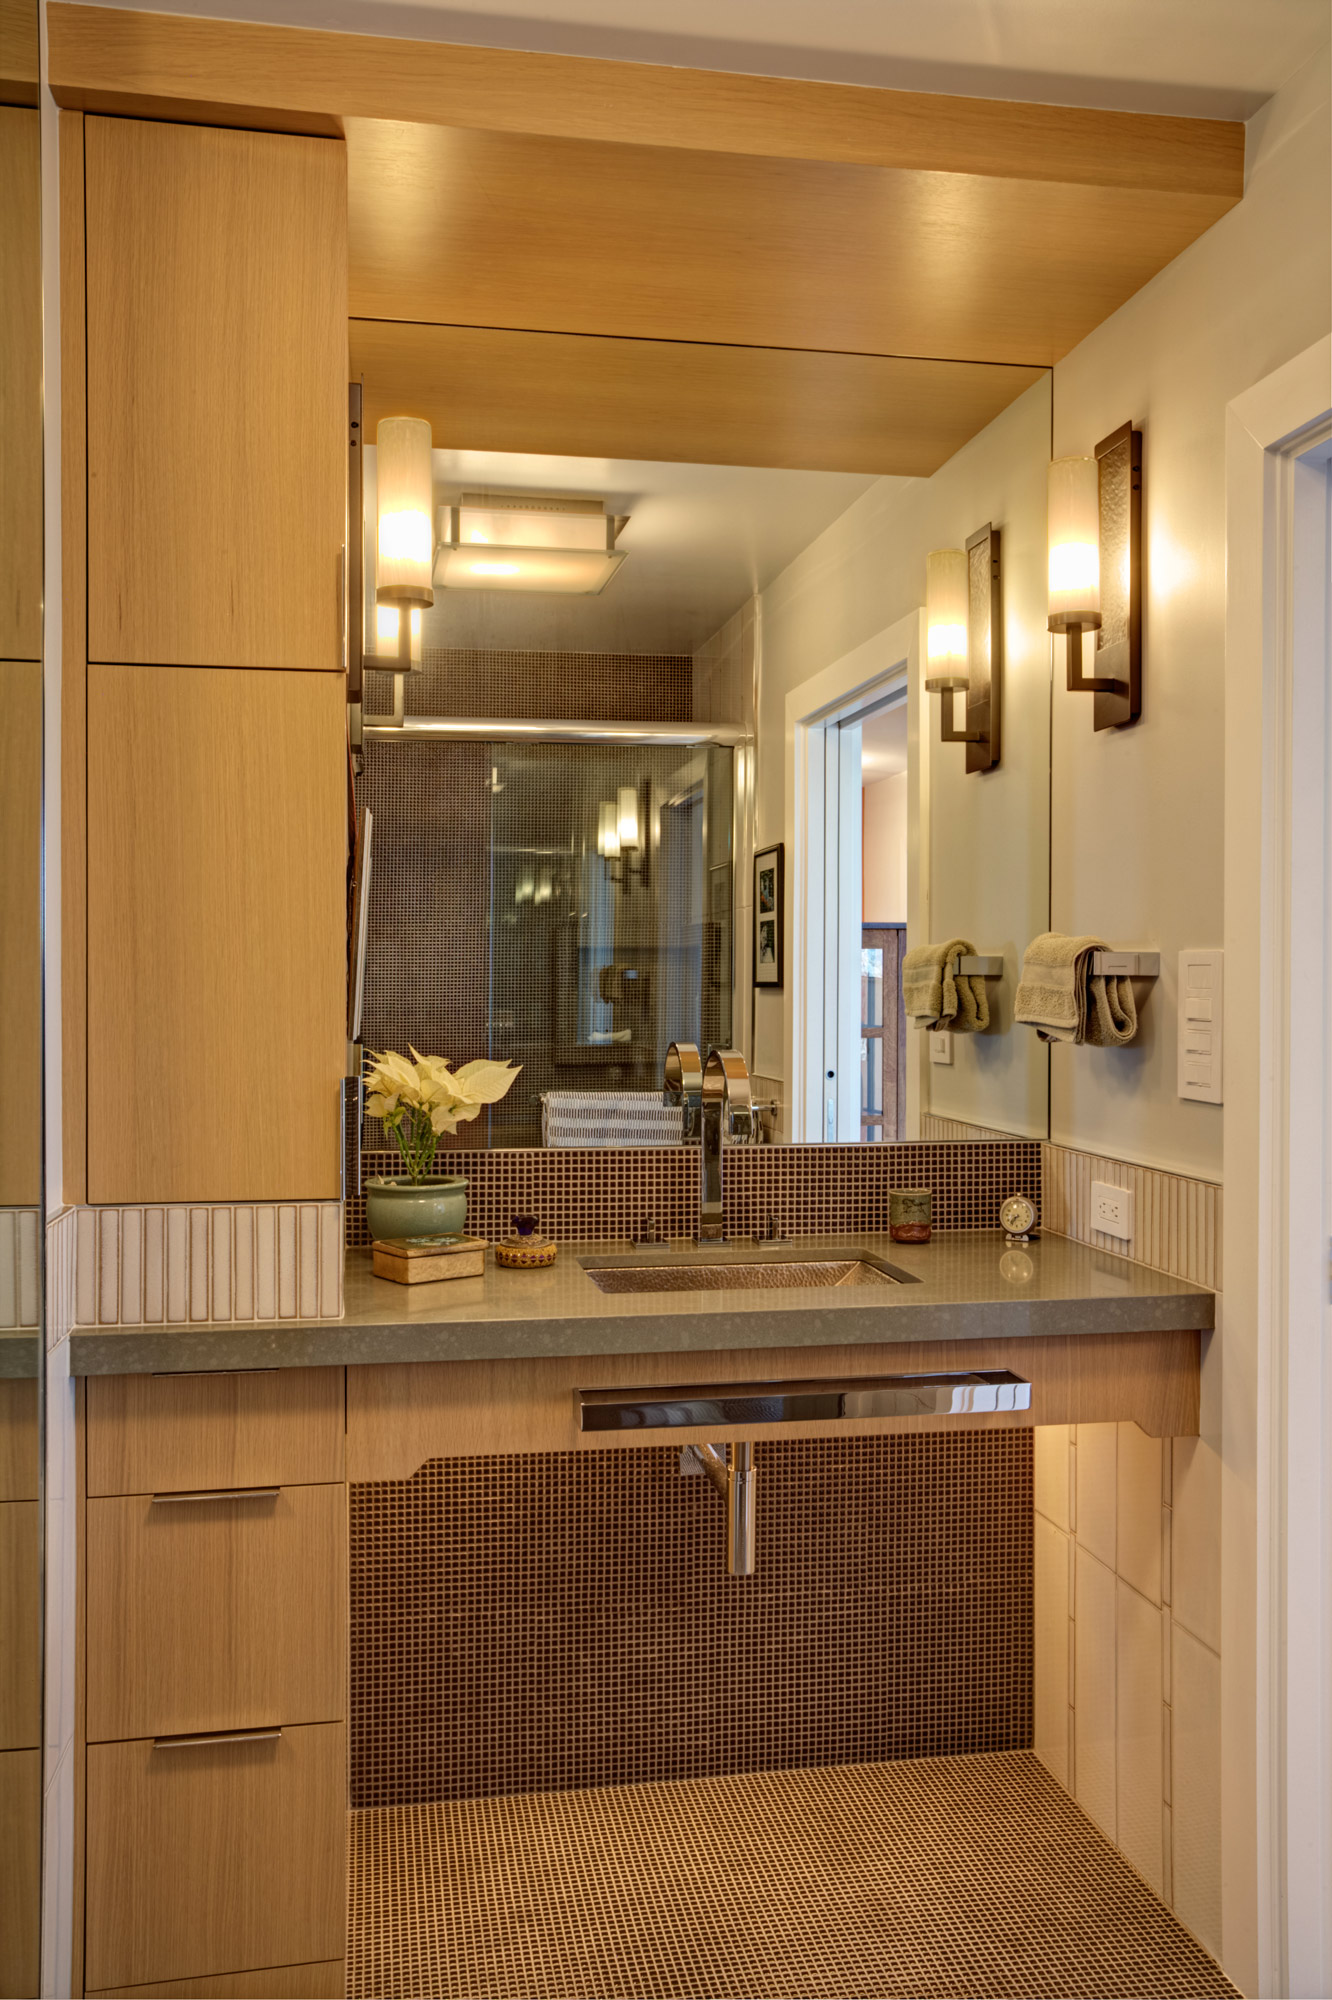 Kaplan-Architects-high-rise-interior-guest-bathroom-vanity-2.jpg